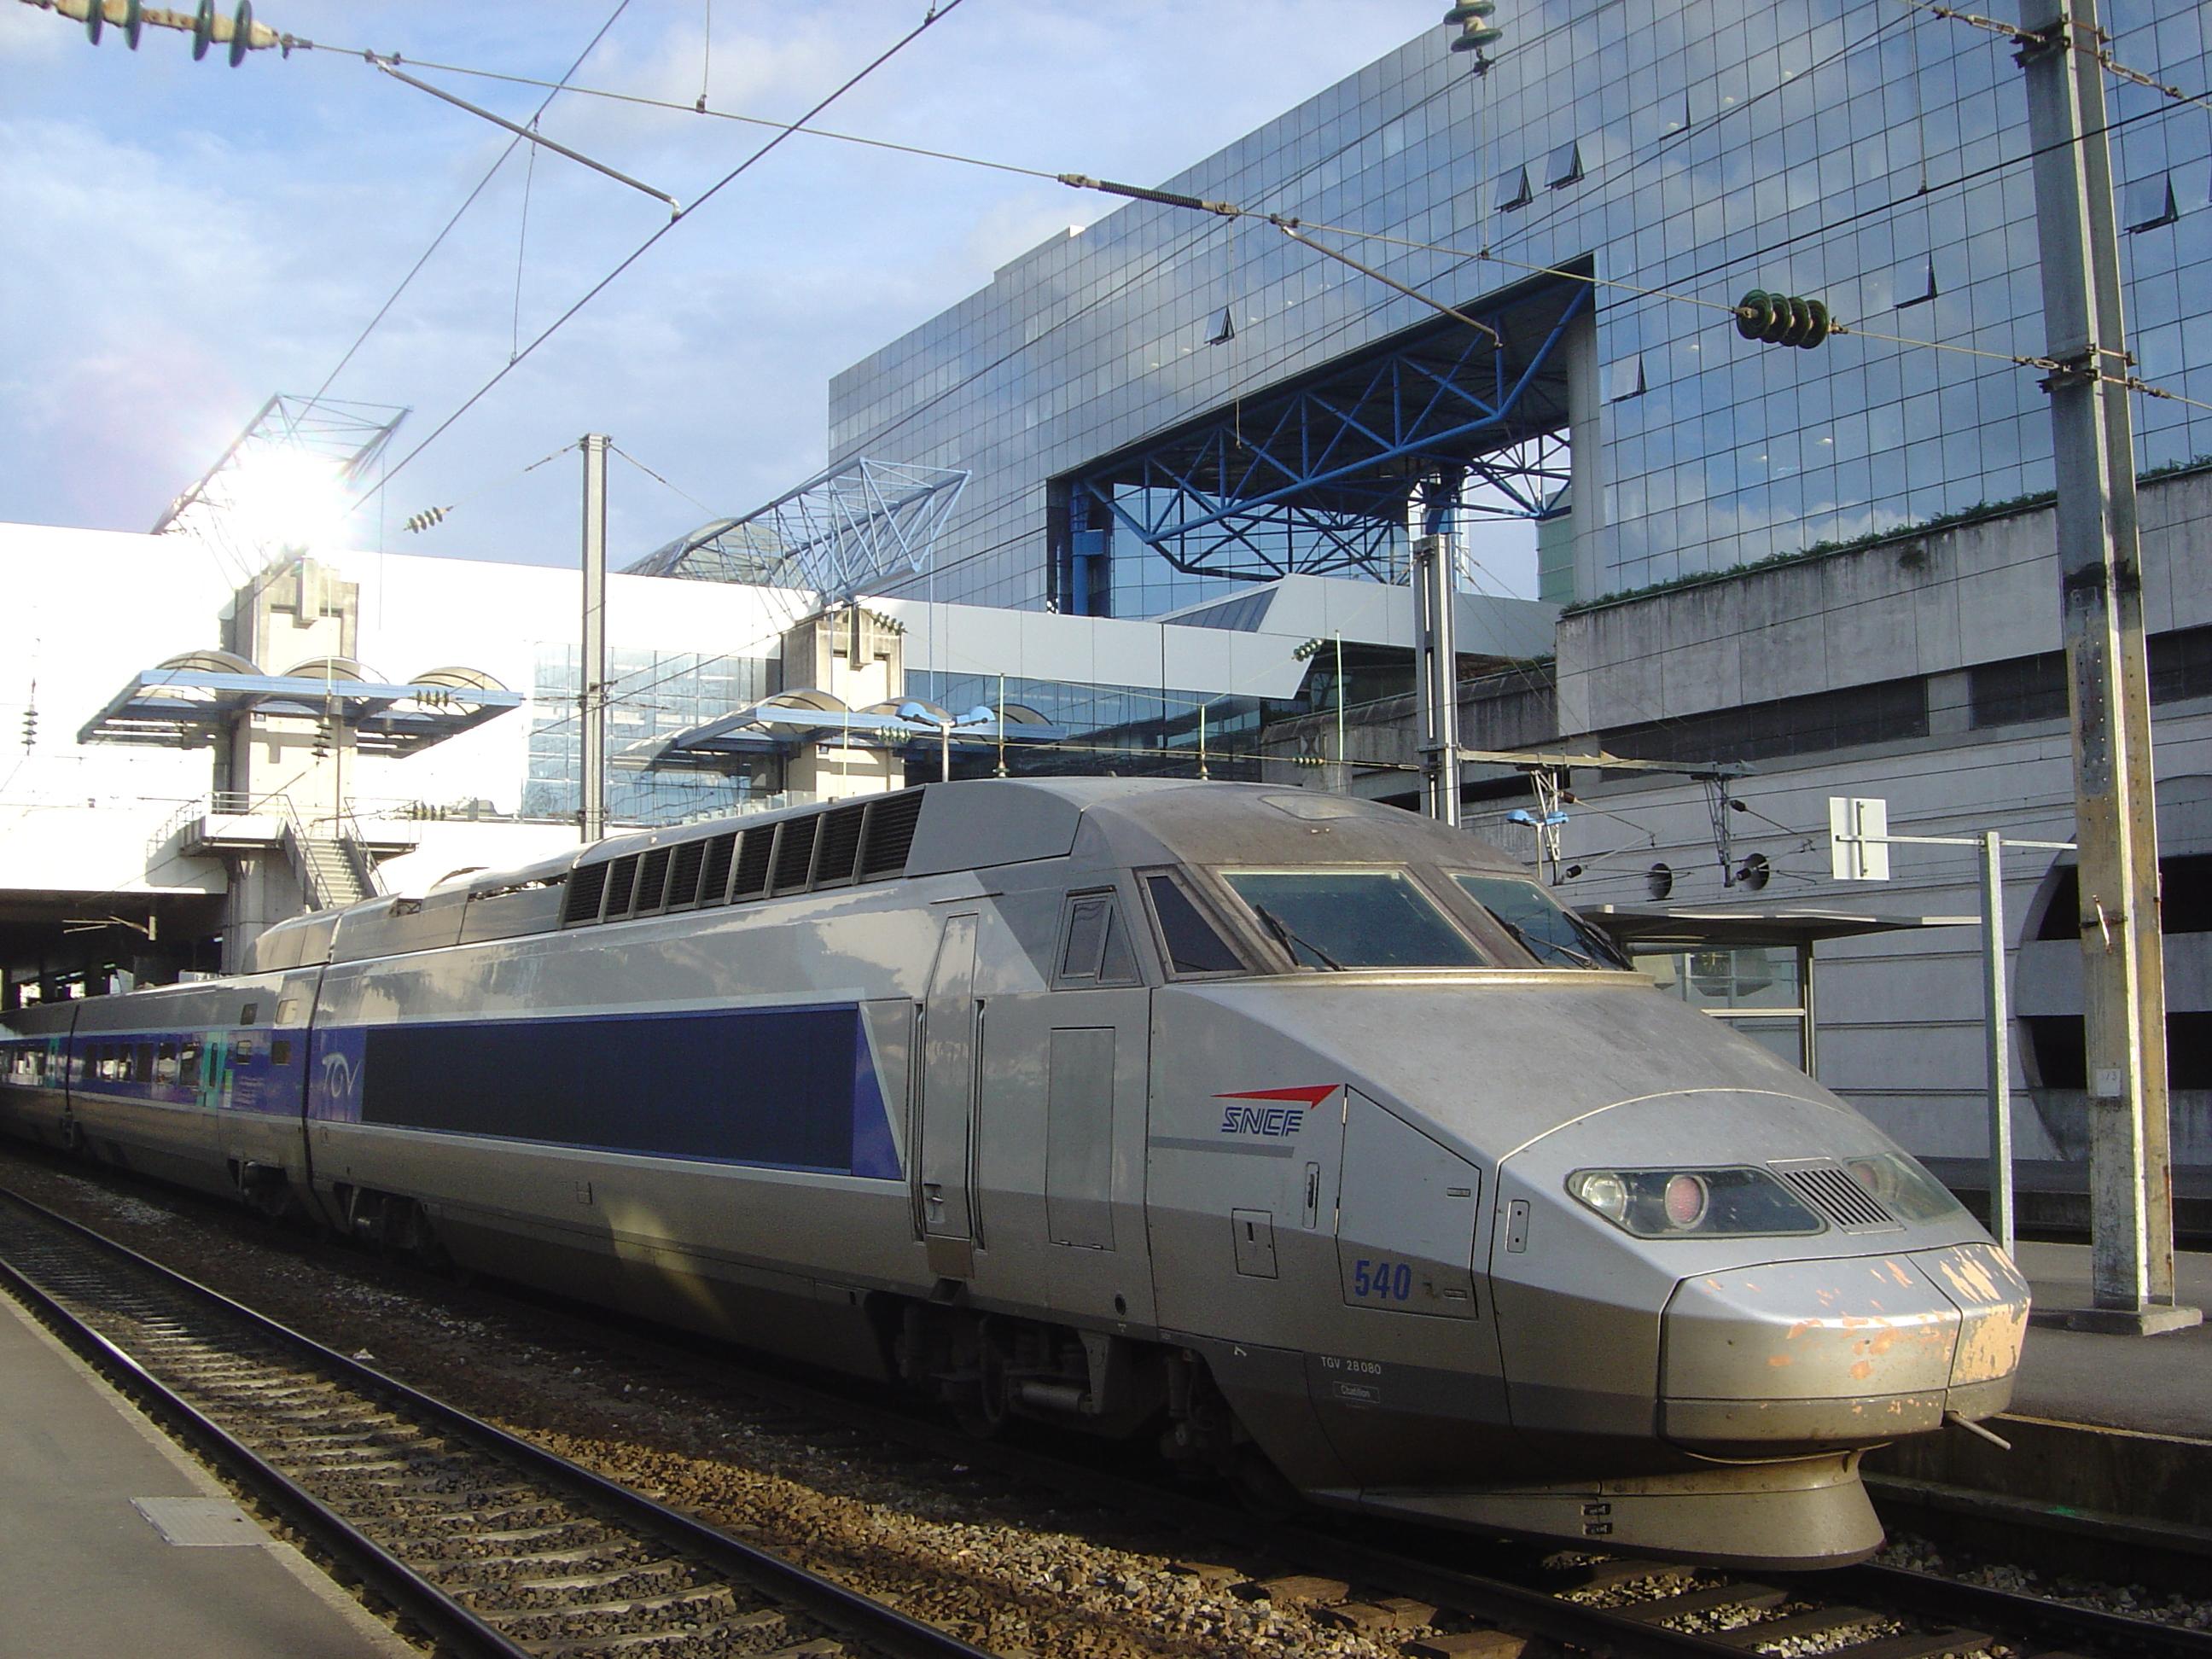 https://upload.wikimedia.org/wikipedia/commons/d/d6/TGV_train_in_Rennes_station_DSC08944.jpg